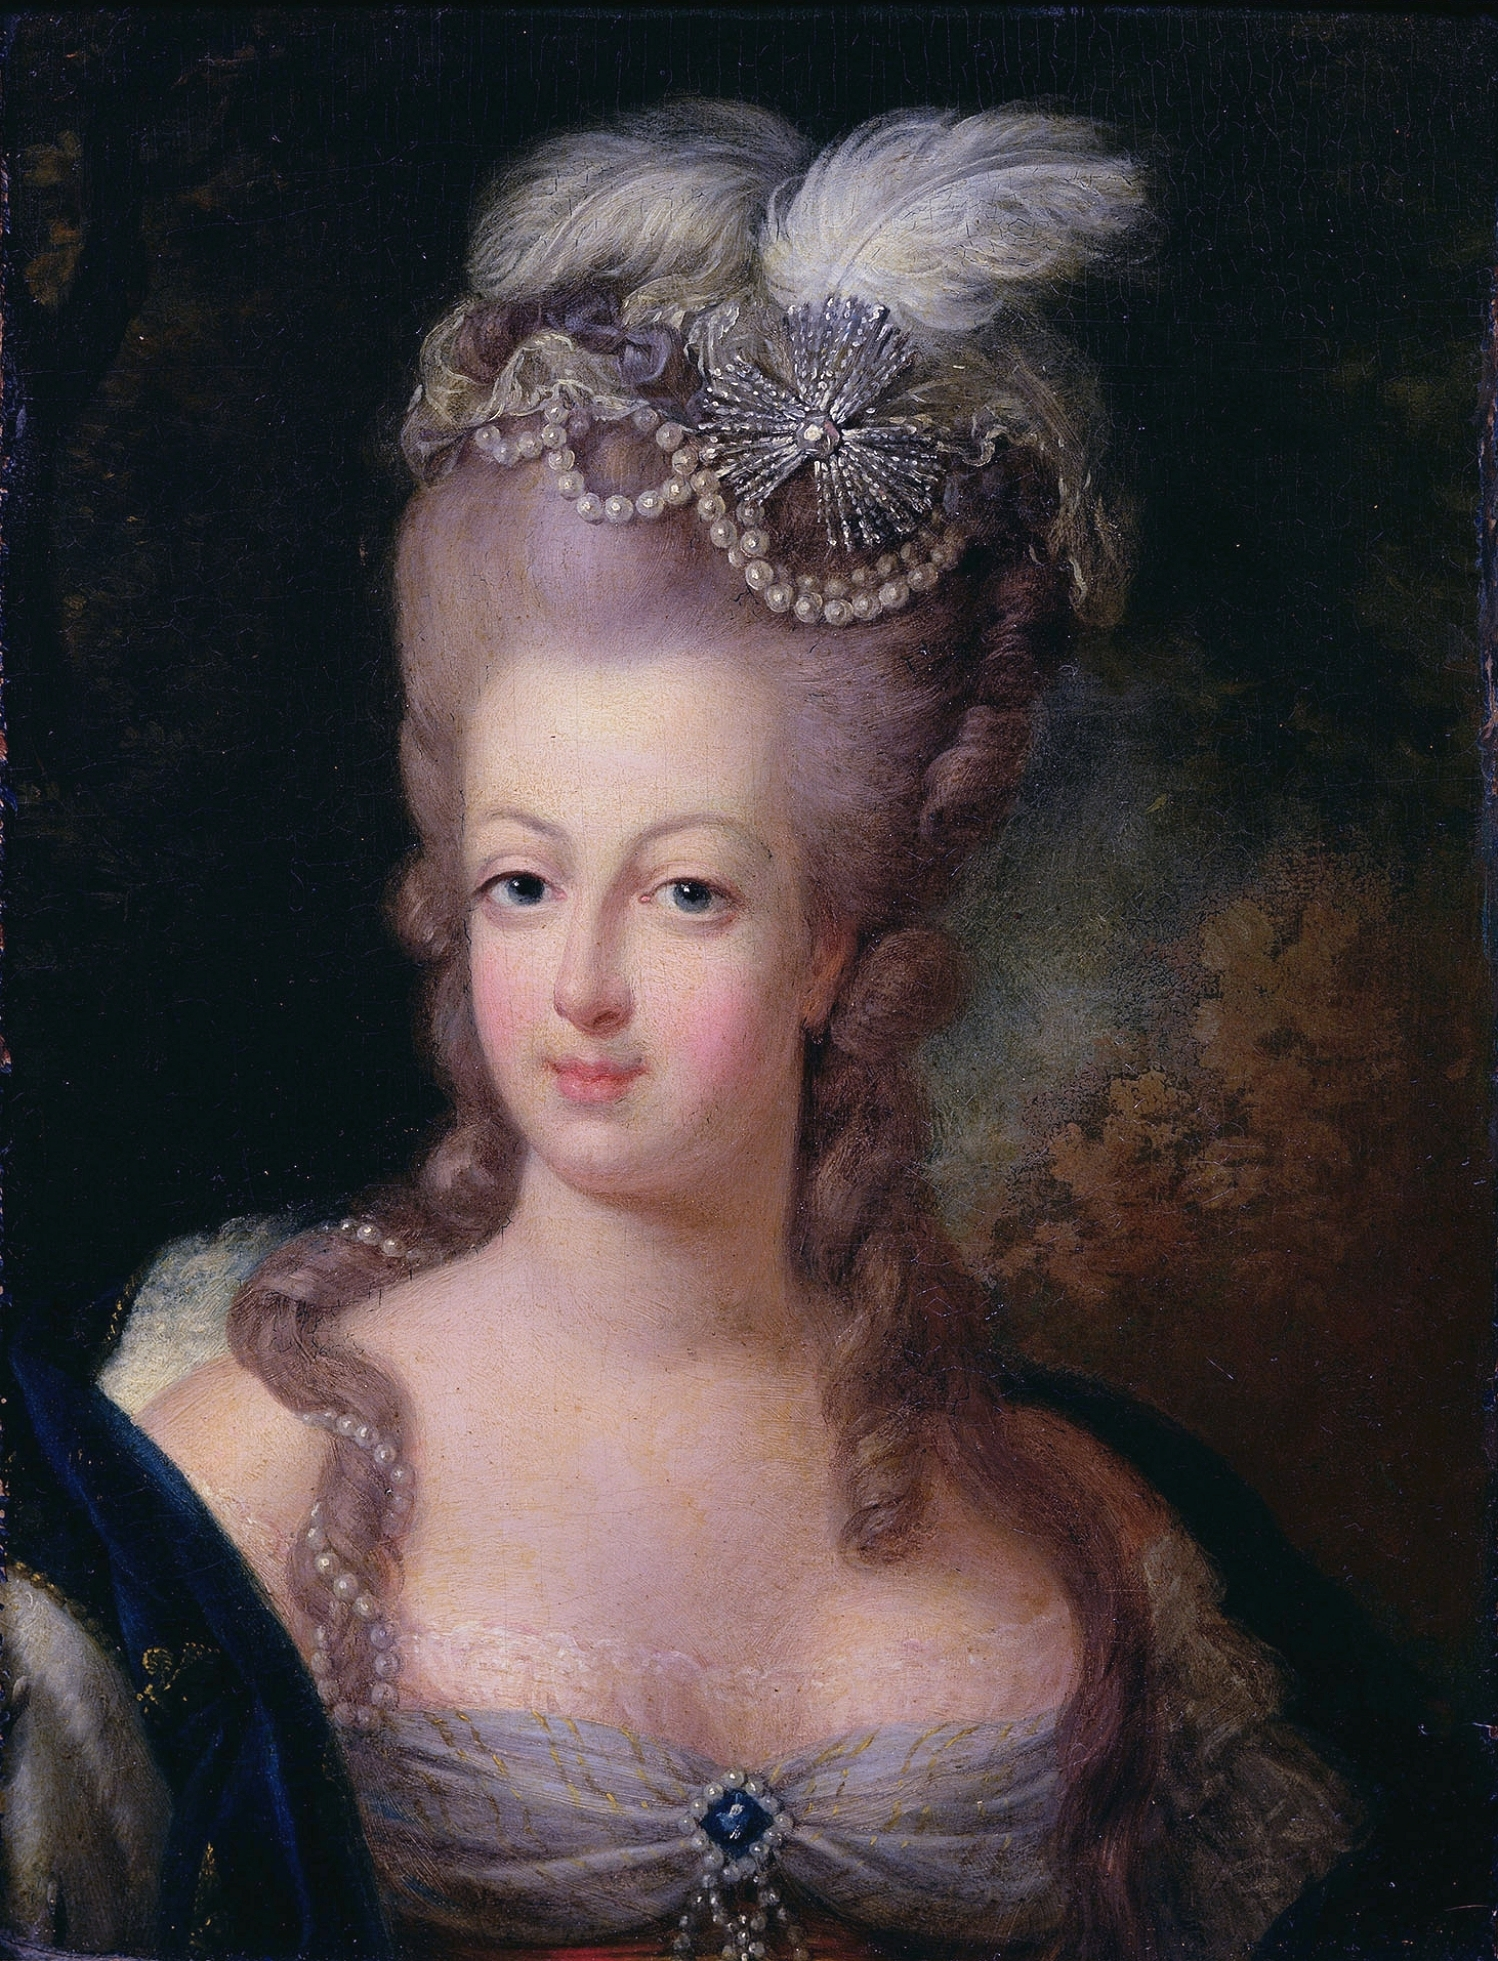 Queen Marie Antoinette of France, 1775